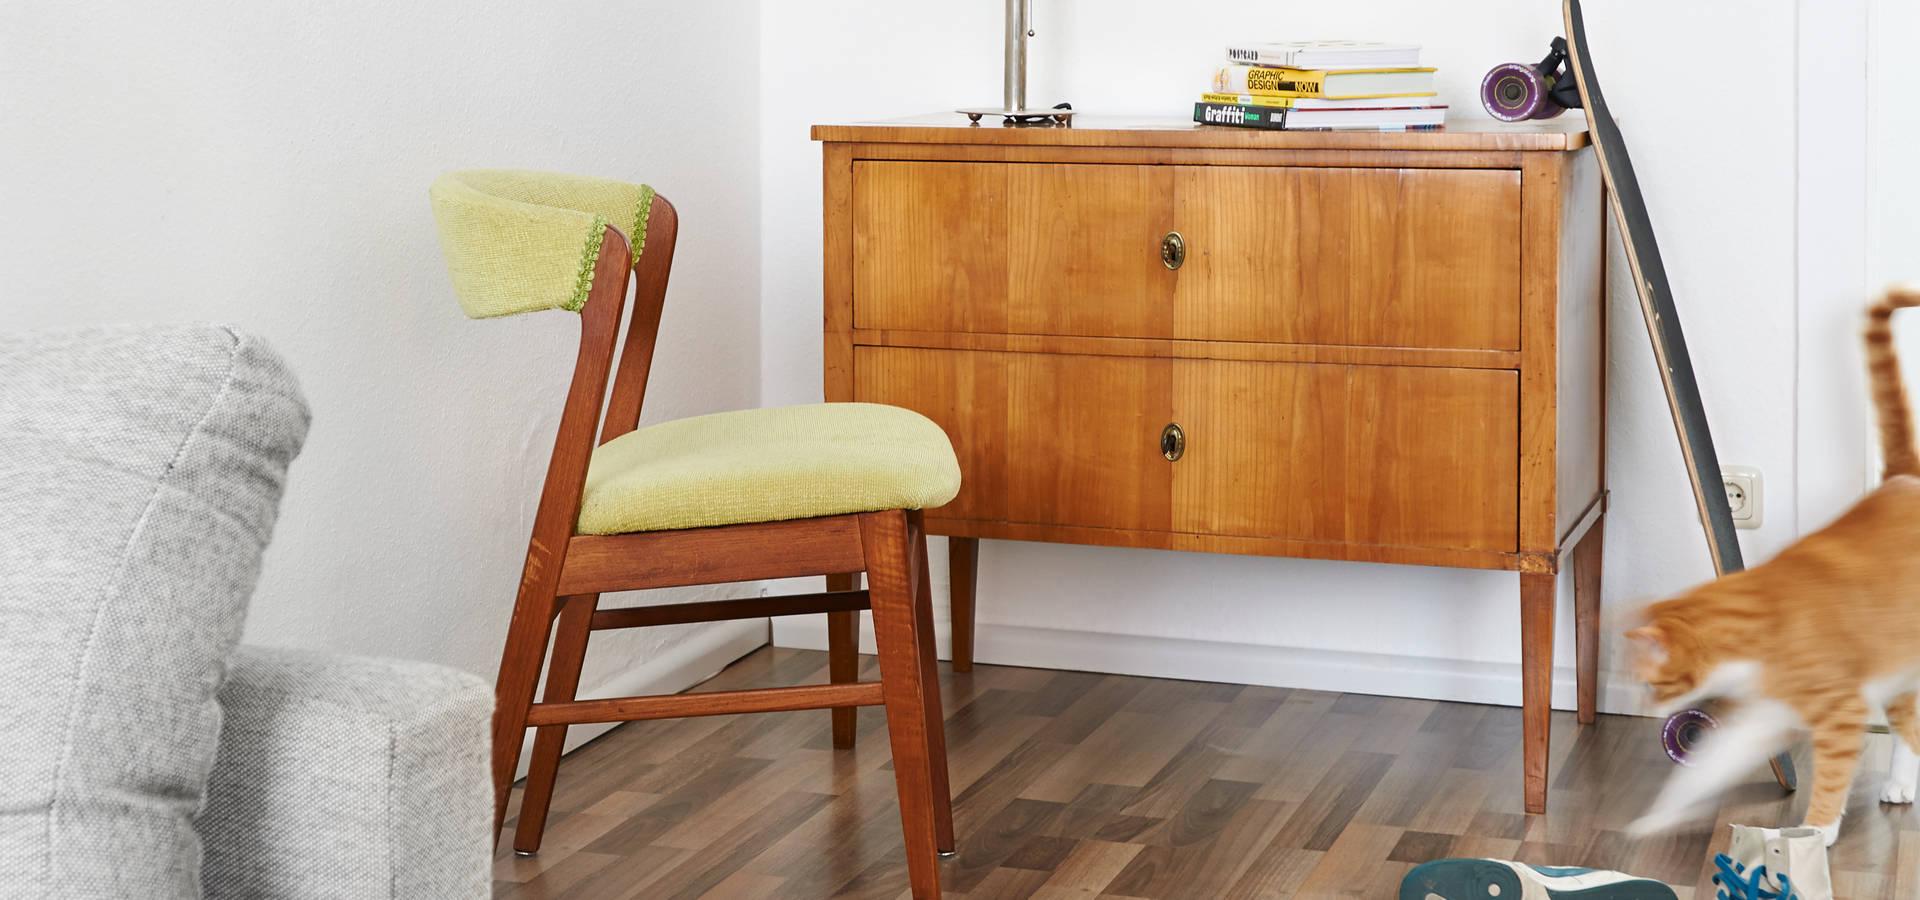 antike m bel metzner m bel accessoires in mainz homify. Black Bedroom Furniture Sets. Home Design Ideas